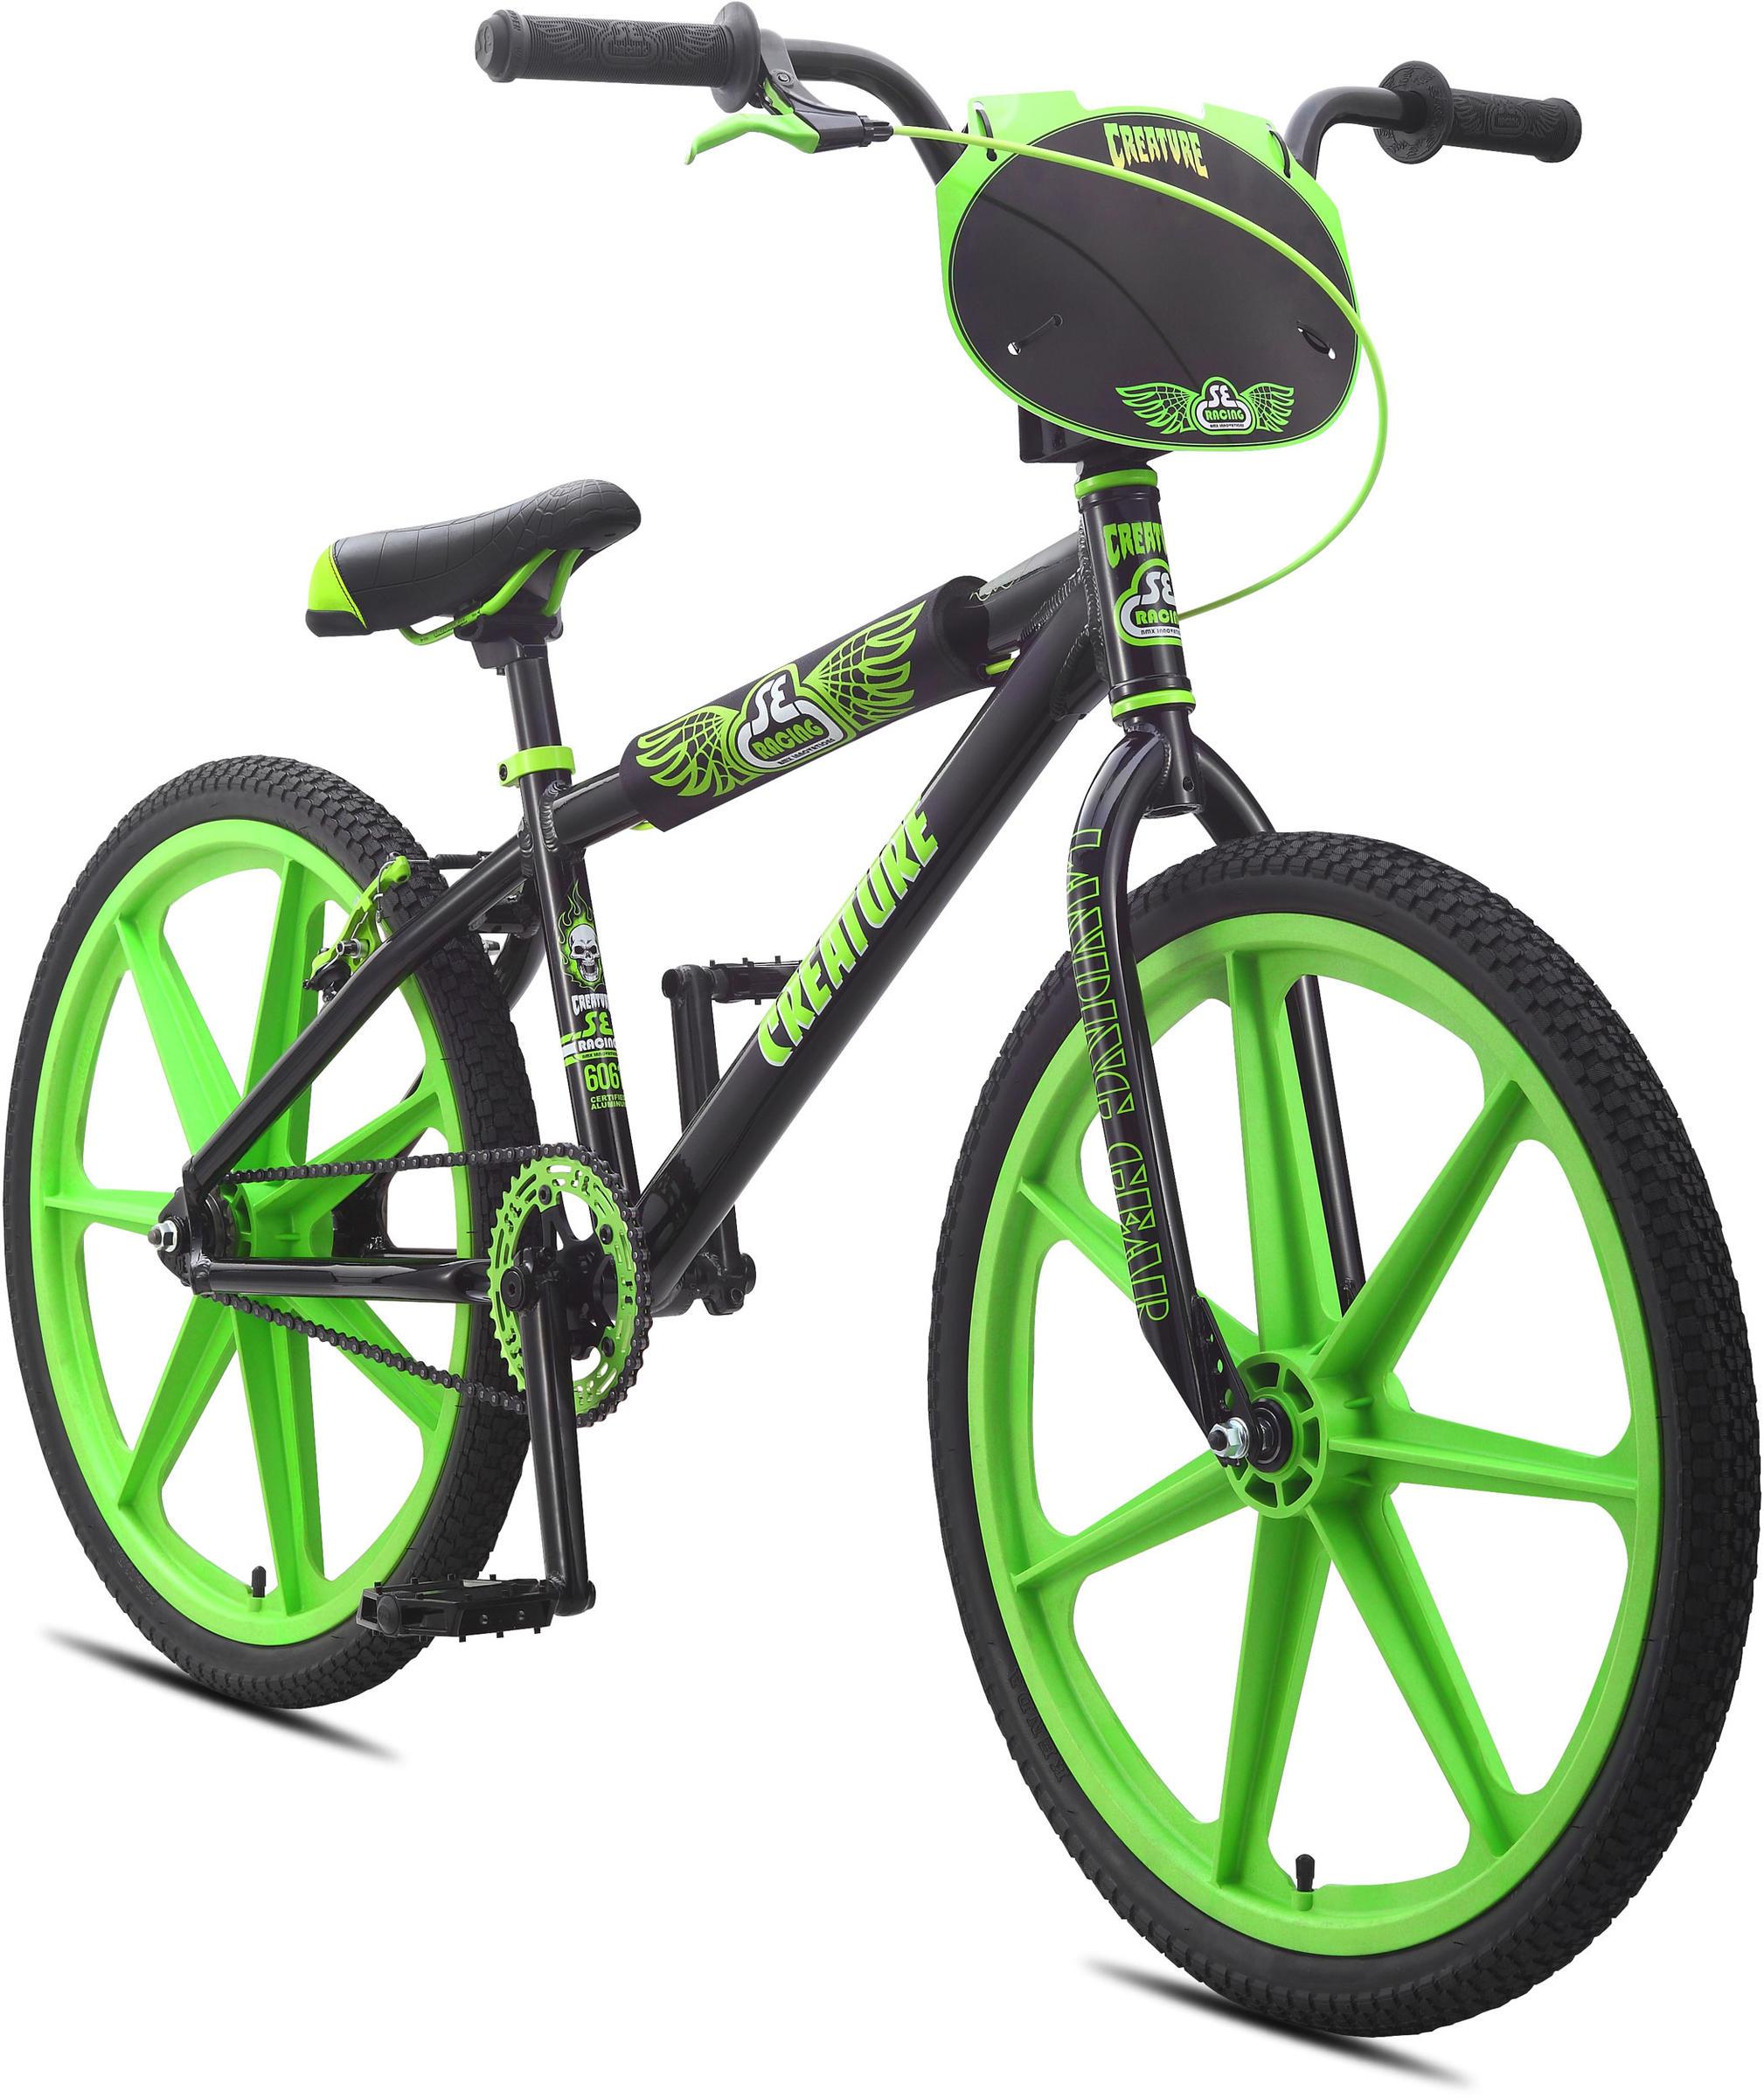 SE Bikes Creature 24 - Don's Bicycles